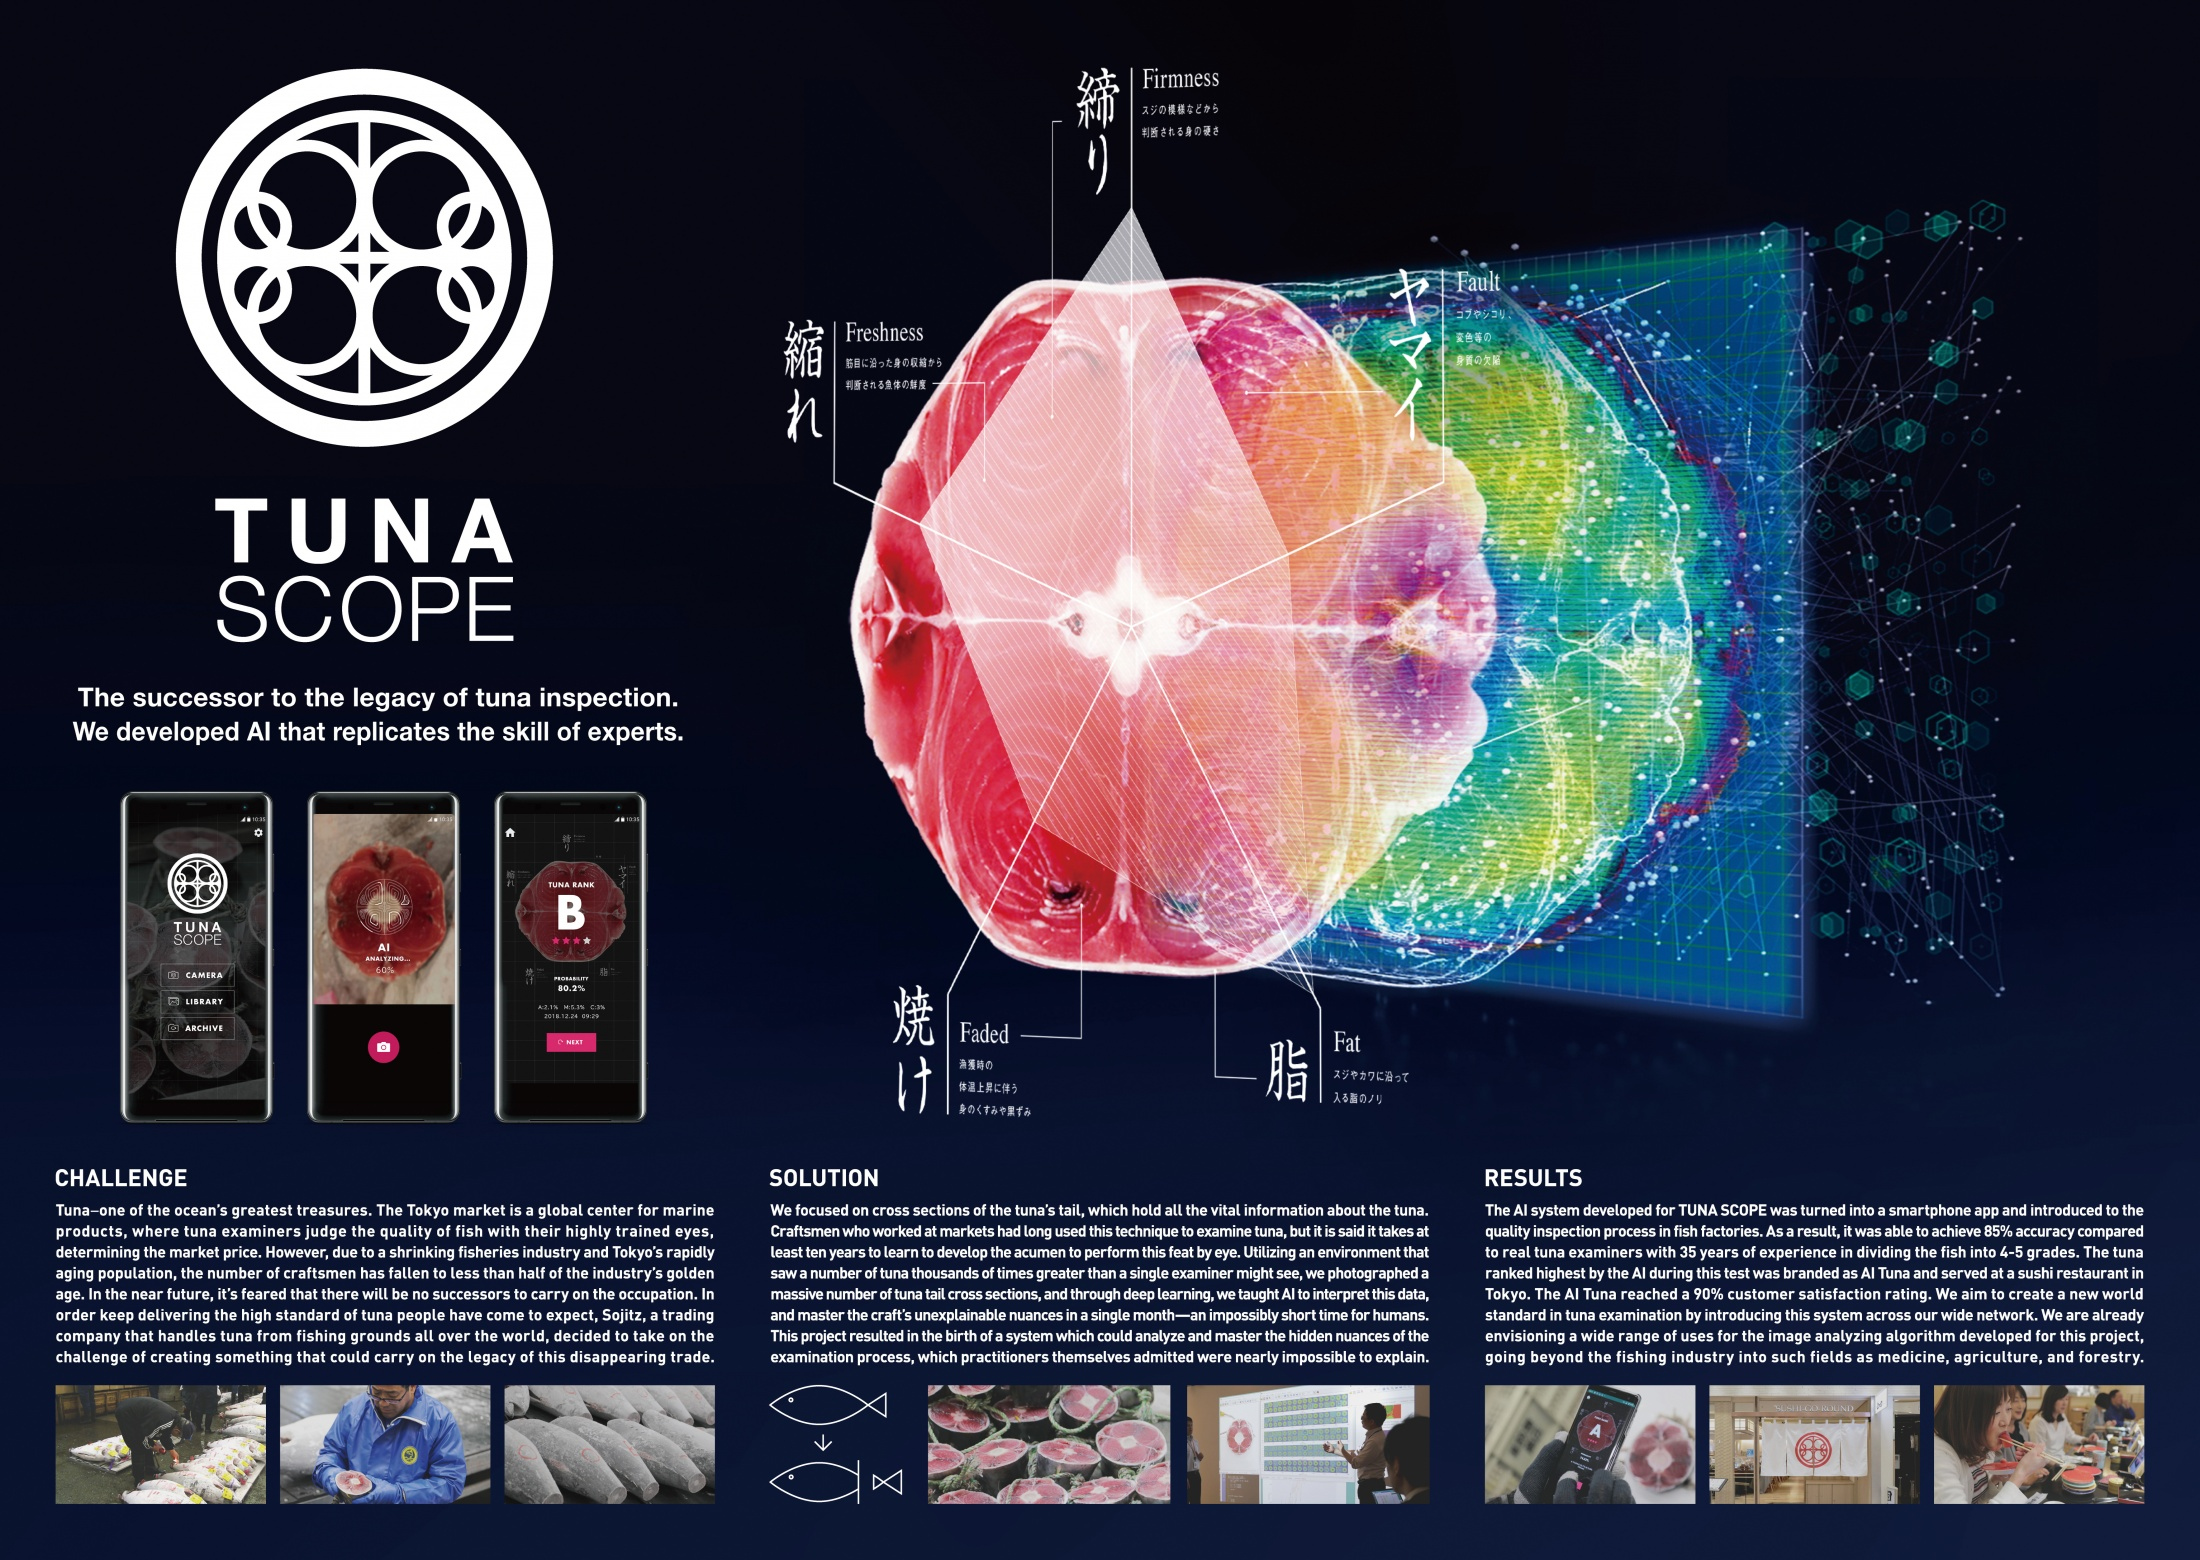 Thumbnail for TUNA SCOPE